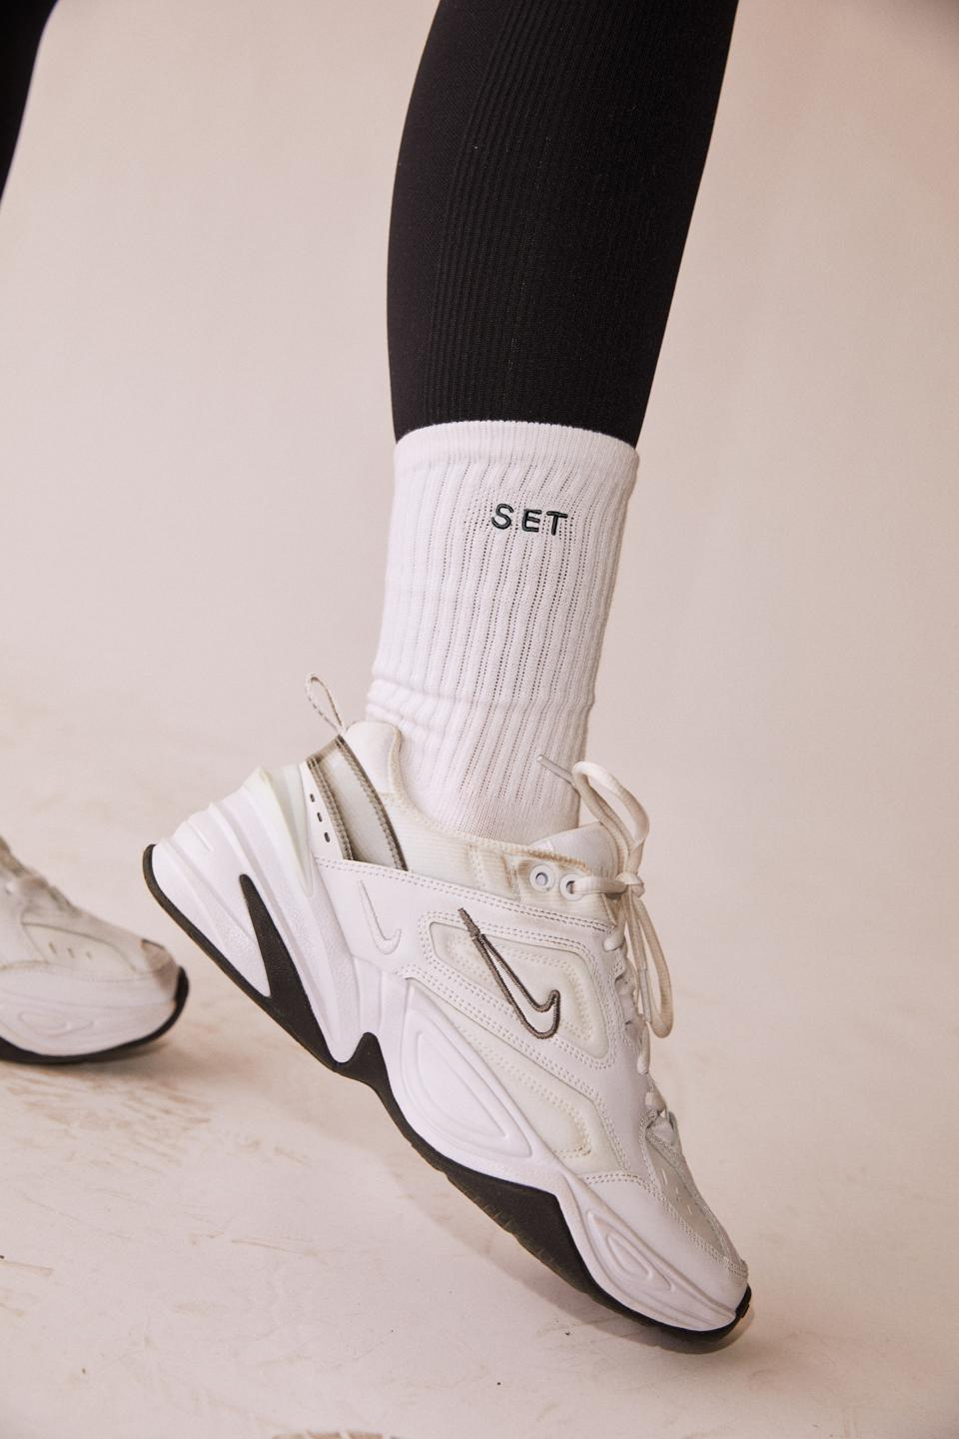 Unisex socks by SET ACTIVE